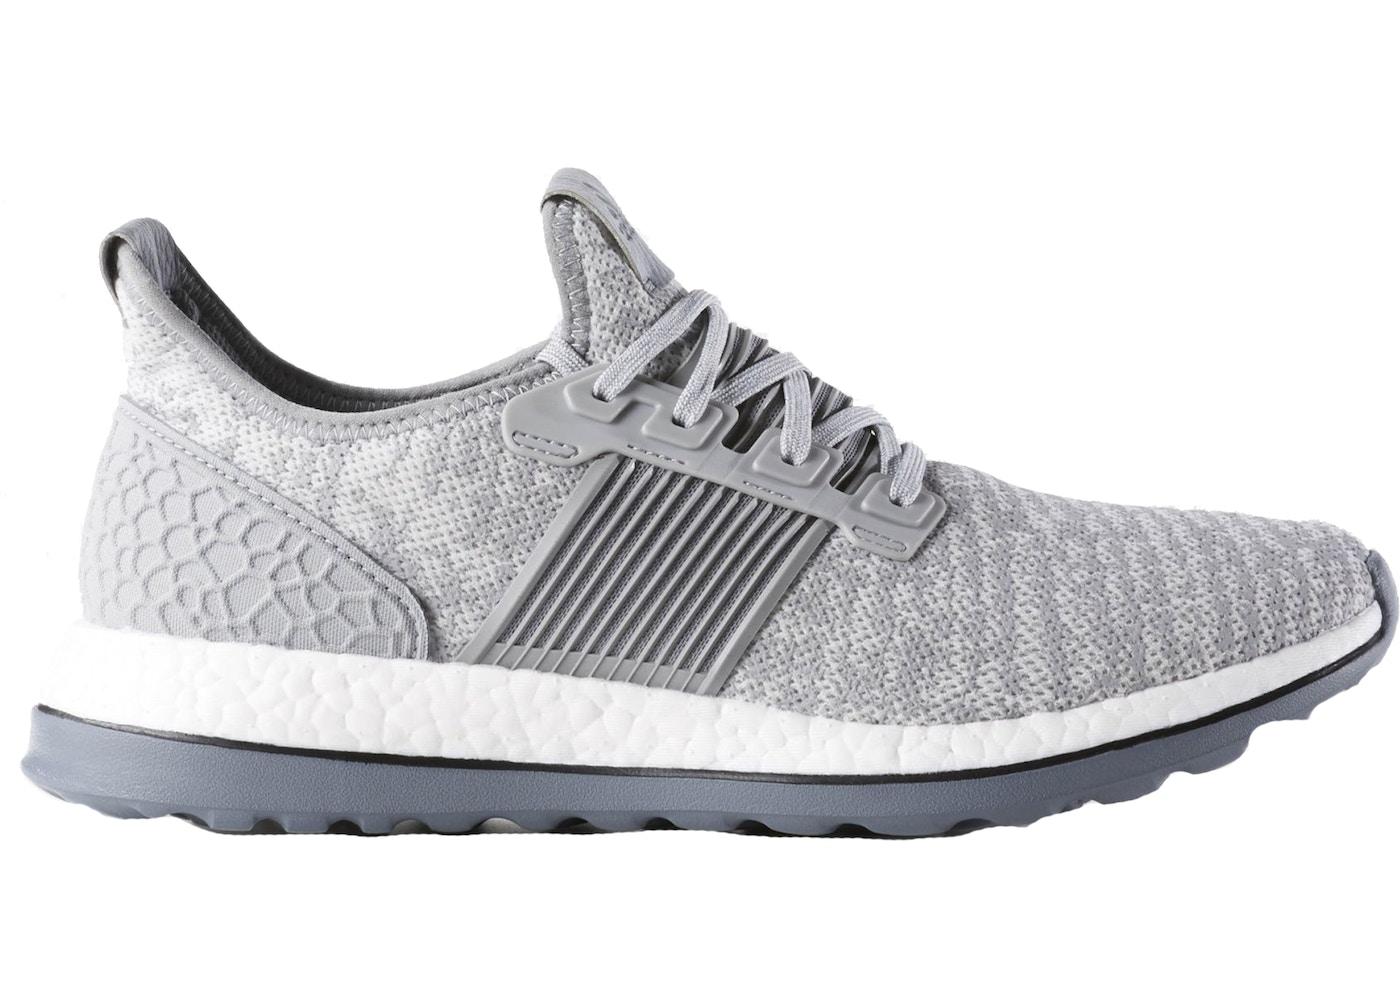 6bb613daa adidas Pureboost ZG Grey - AQ6768